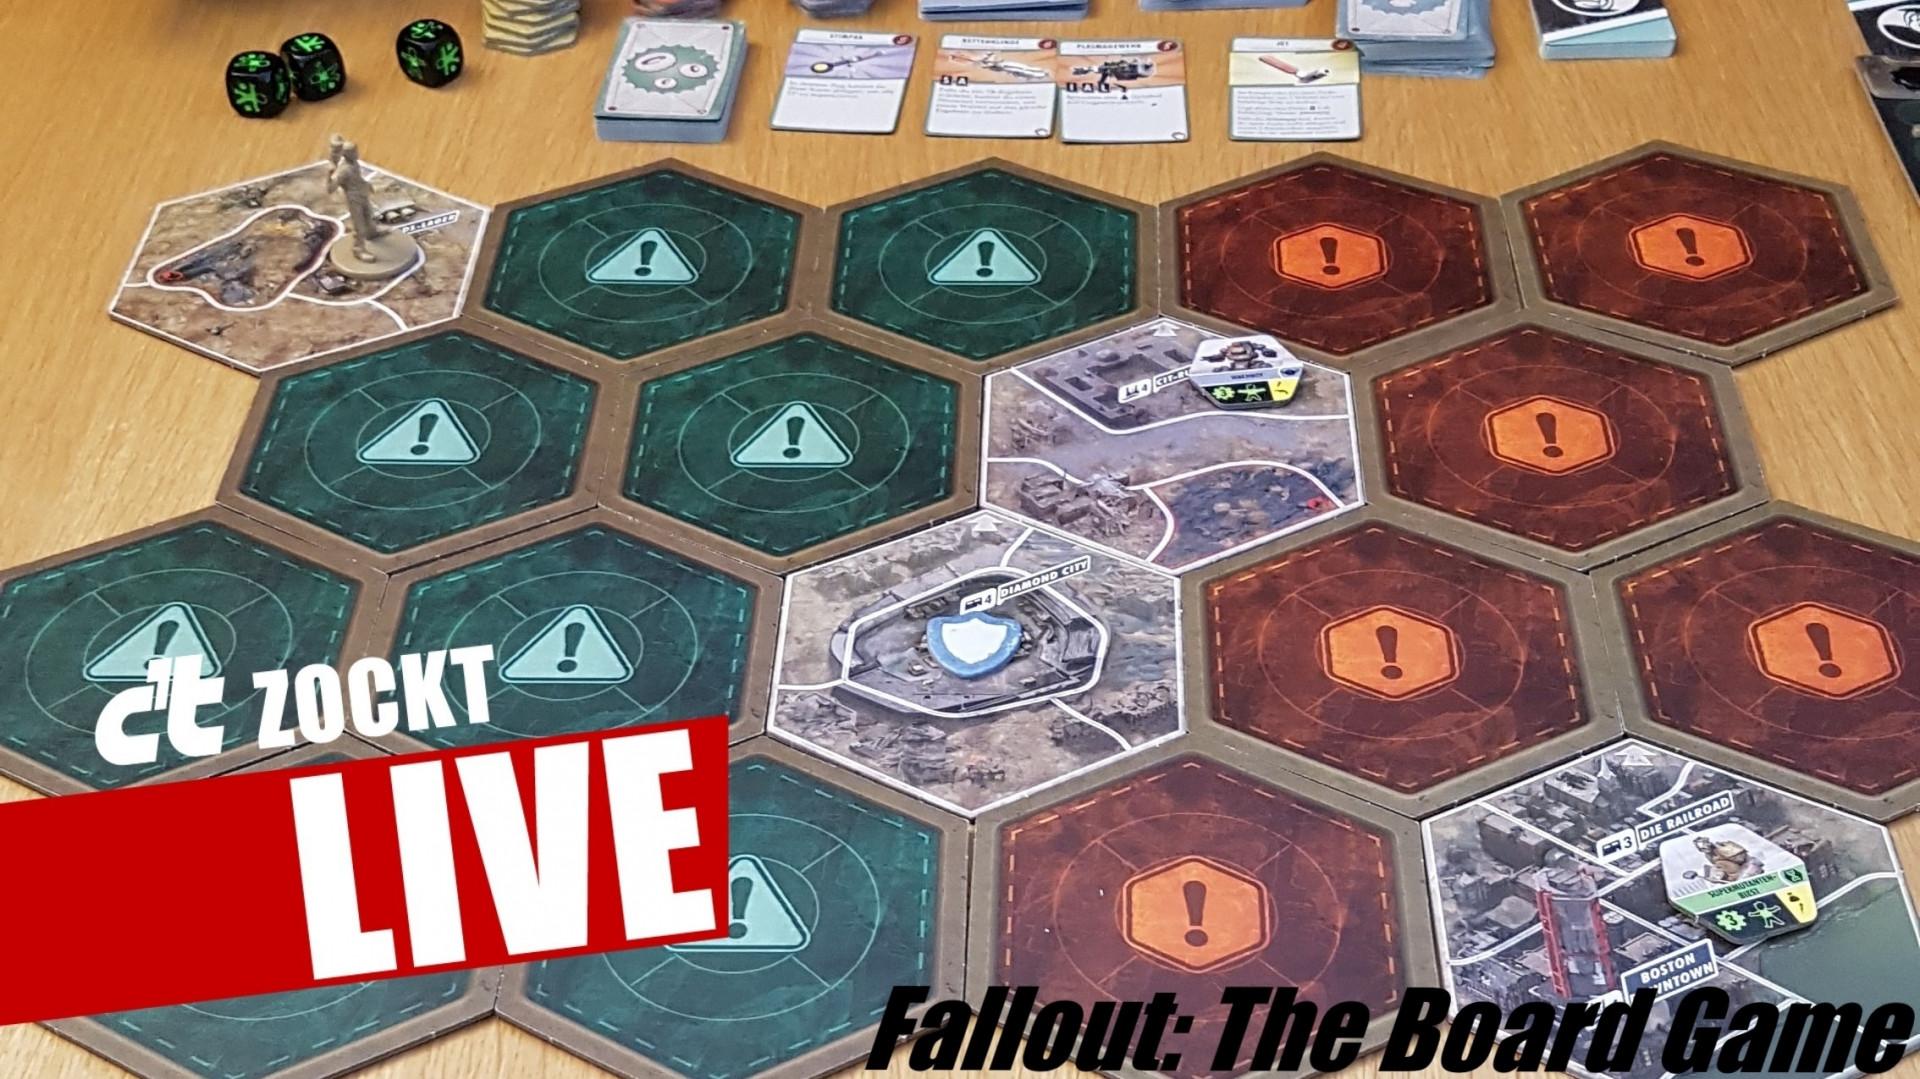 c't zockt LIVE Fallout: The Board Game - Mit Würfeln im Wasteland